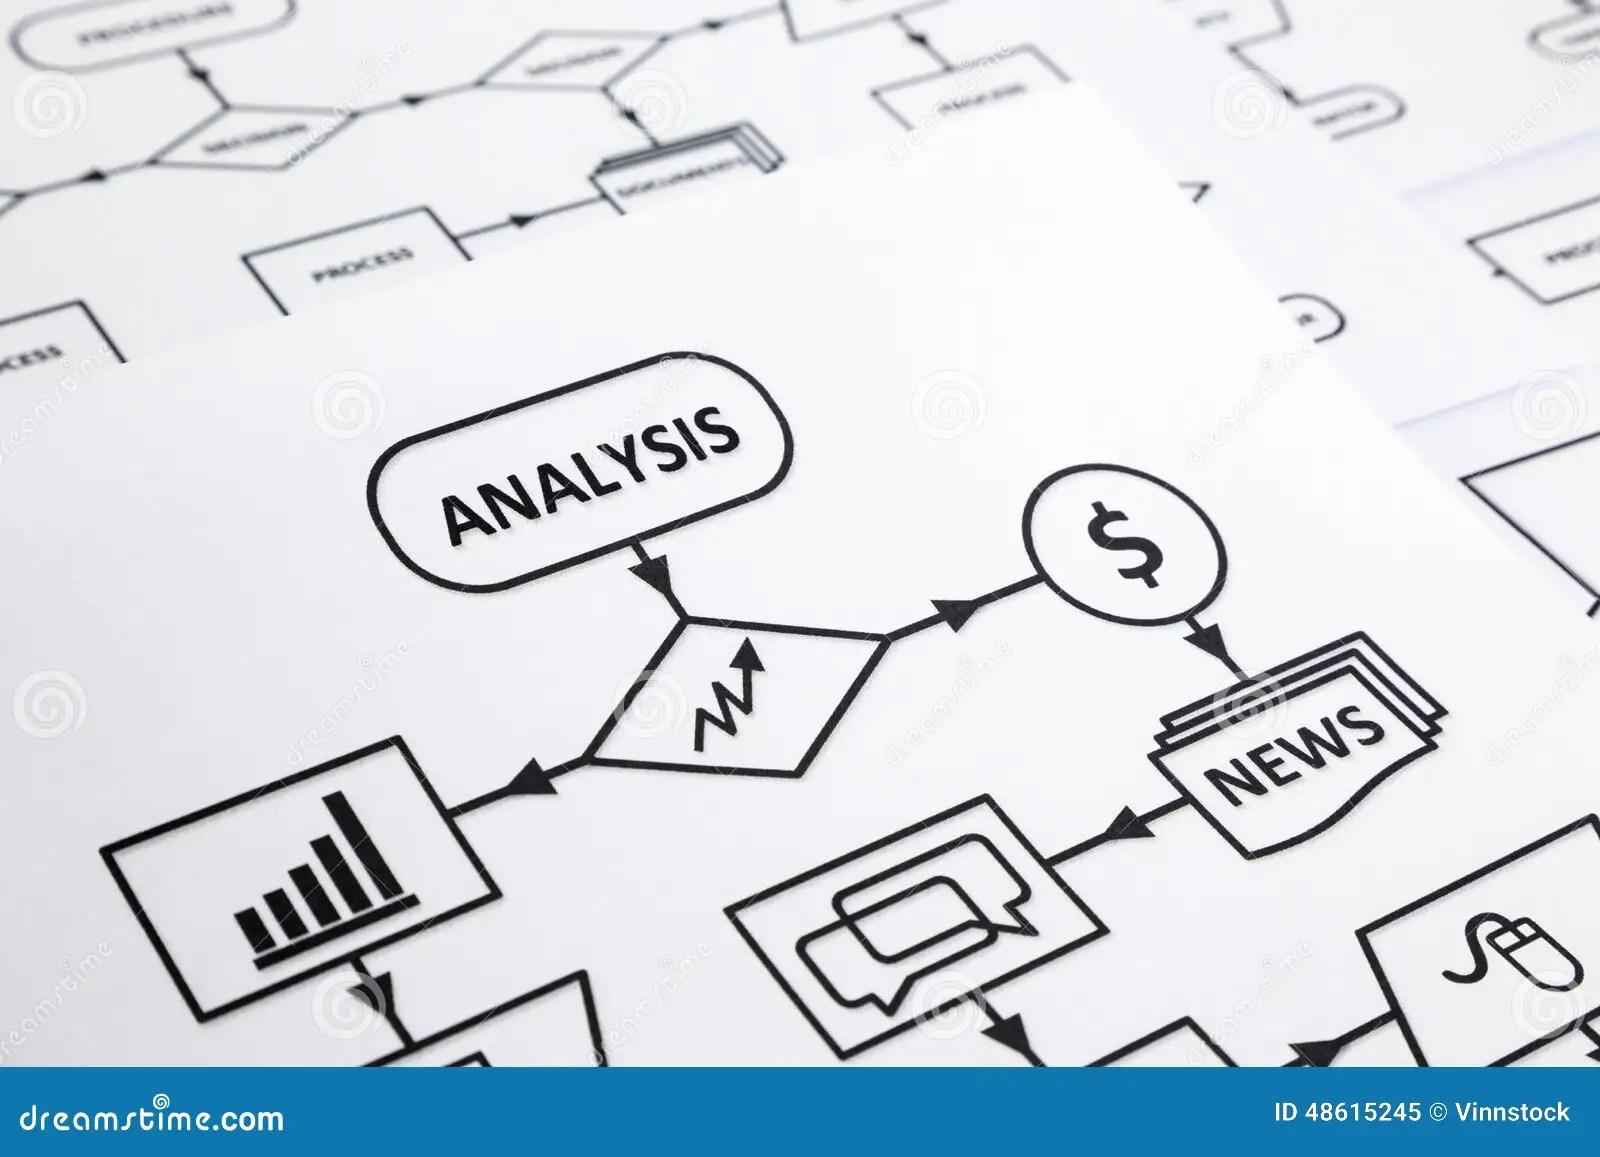 Ysis Chart Foryzing Stock Image